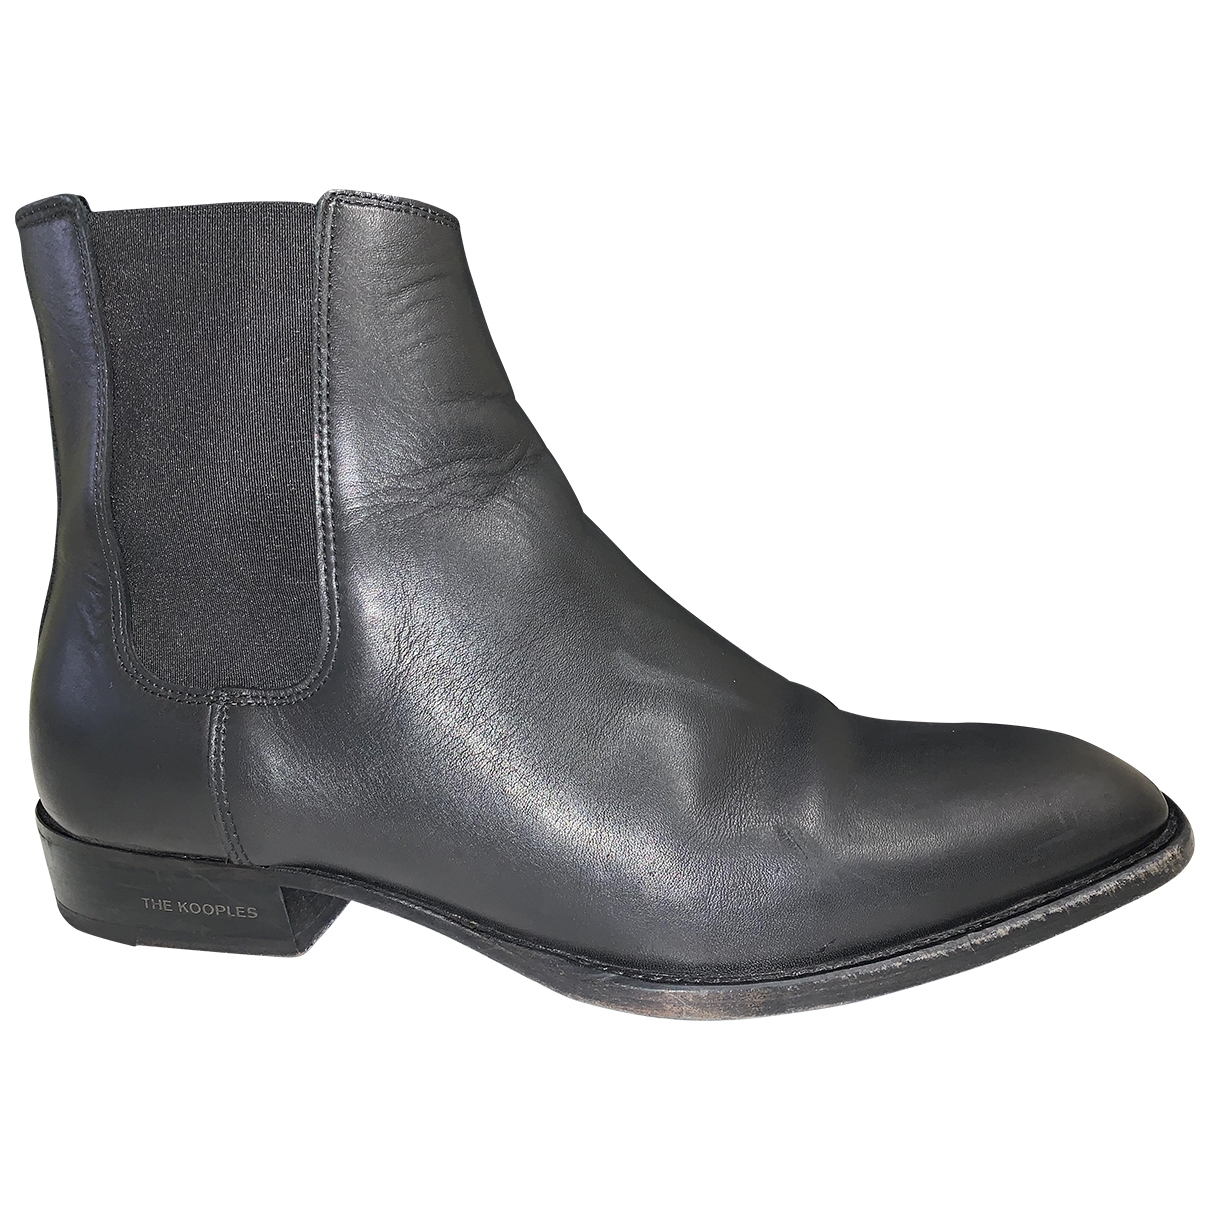 The Kooples Spring Summer 2019 Black Leather Boots for Men 43 EU